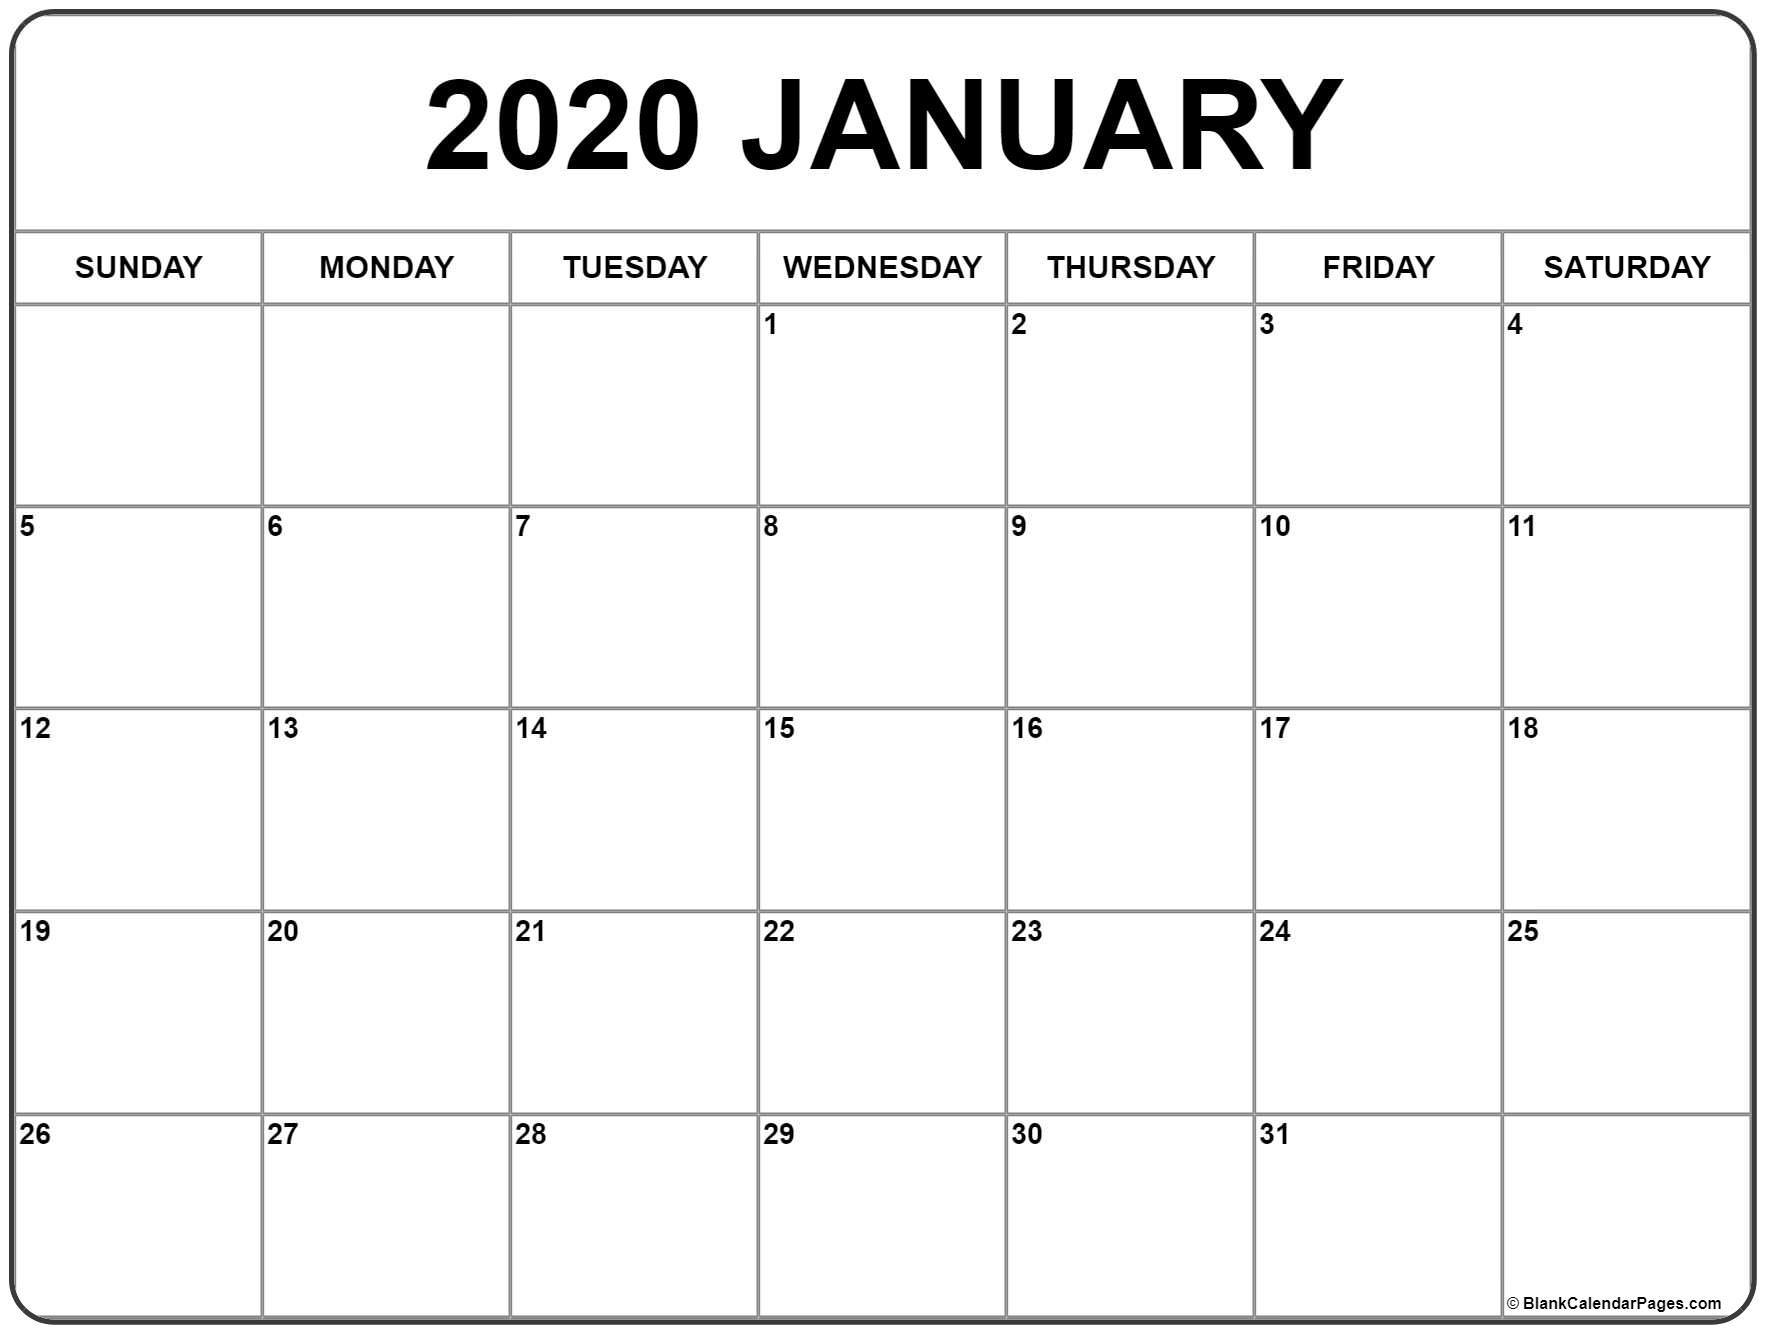 January 2020 Calendar | Free Printable Monthly Calendars-January 2020 Calendar Full Moon